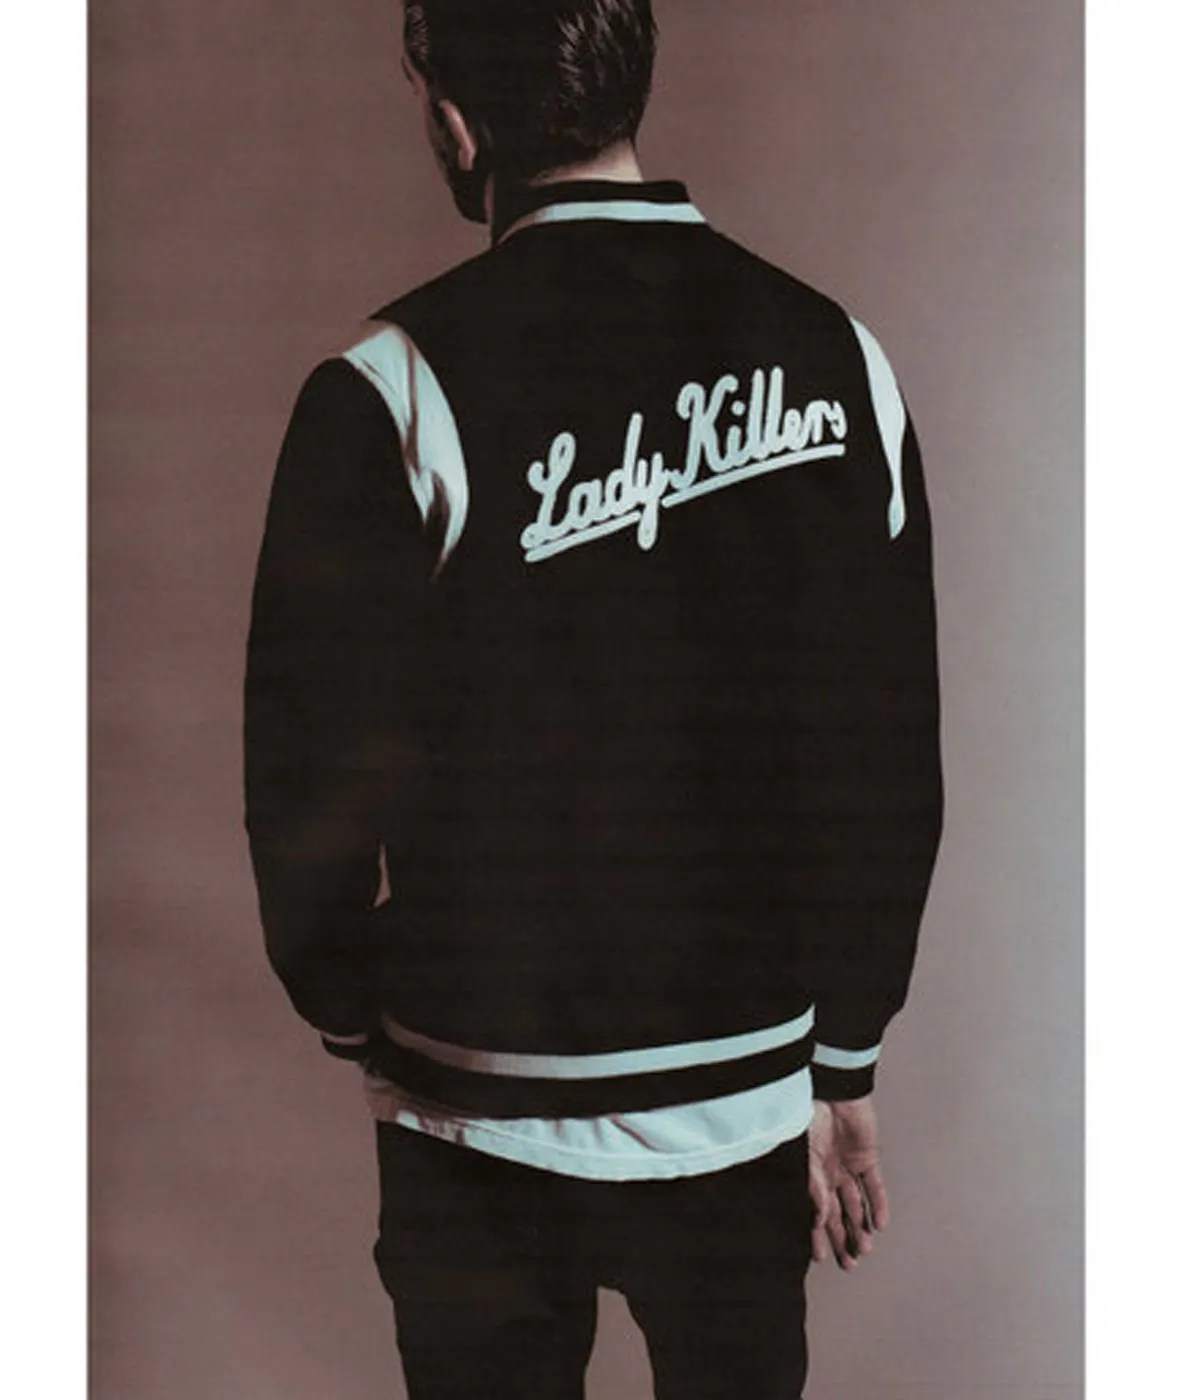 lady-killers-g-eazy-jacket